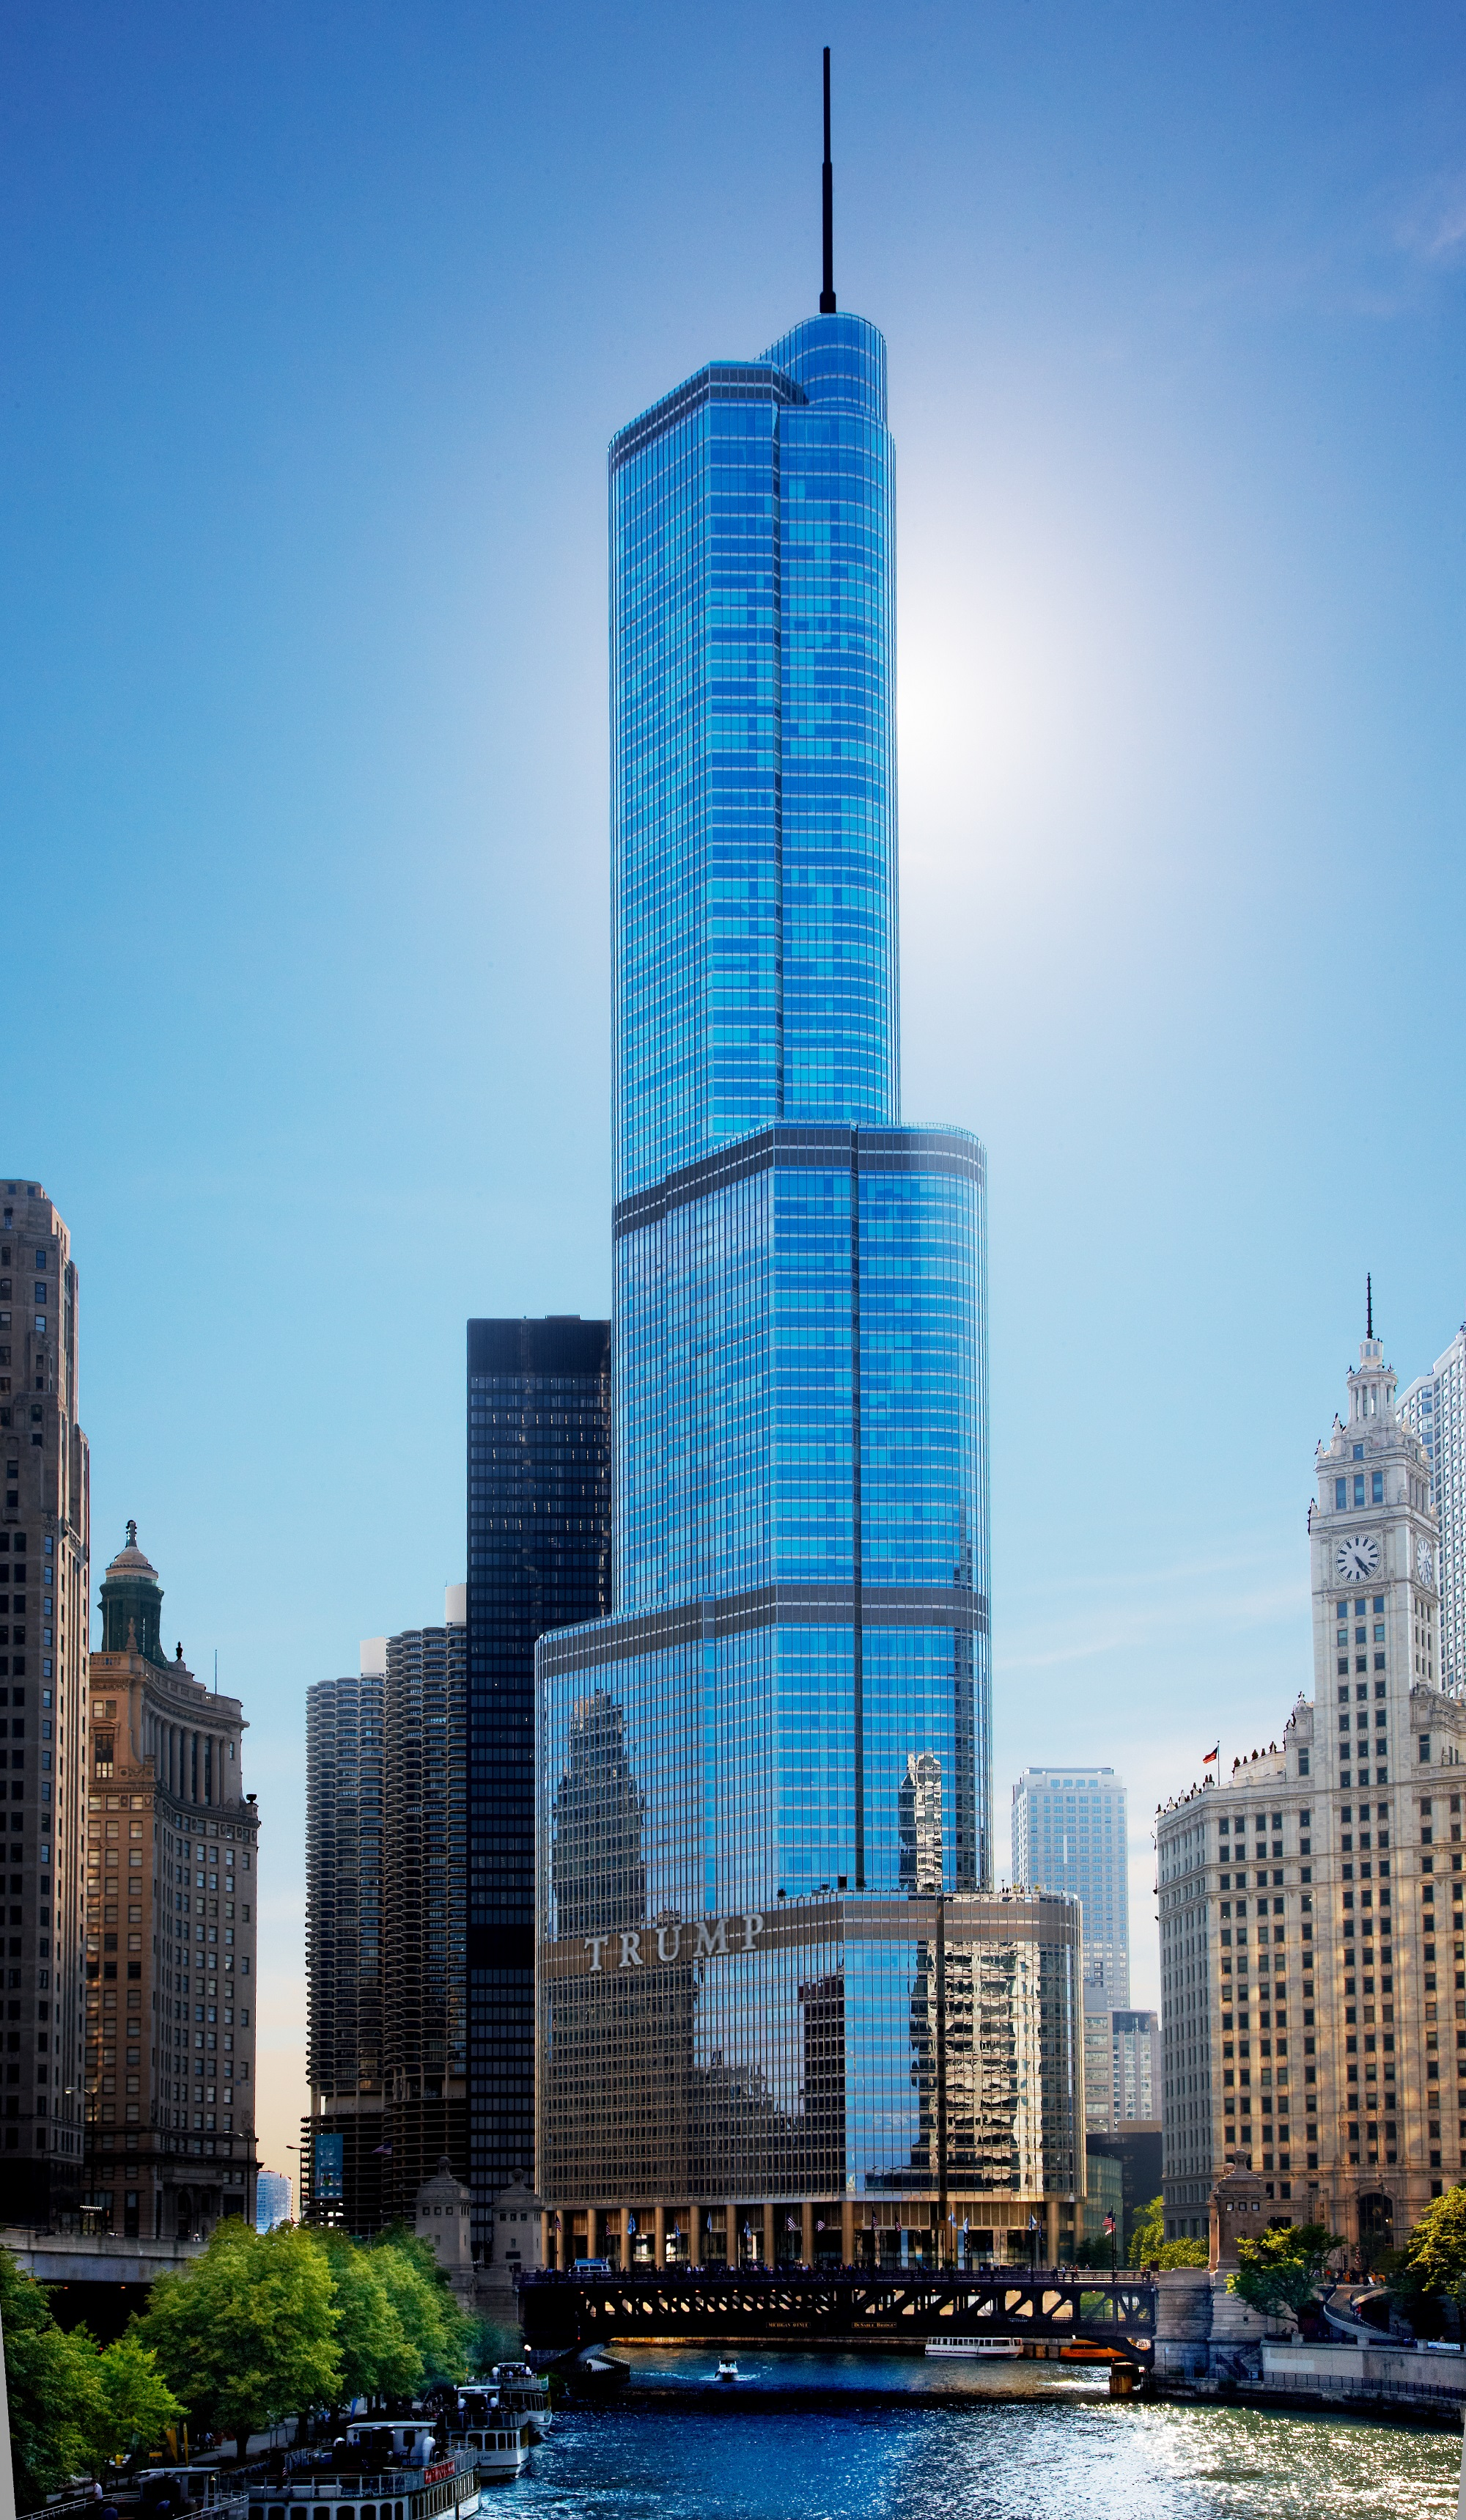 Stylish Elegance at Trump International Hotel & Tower Chicago